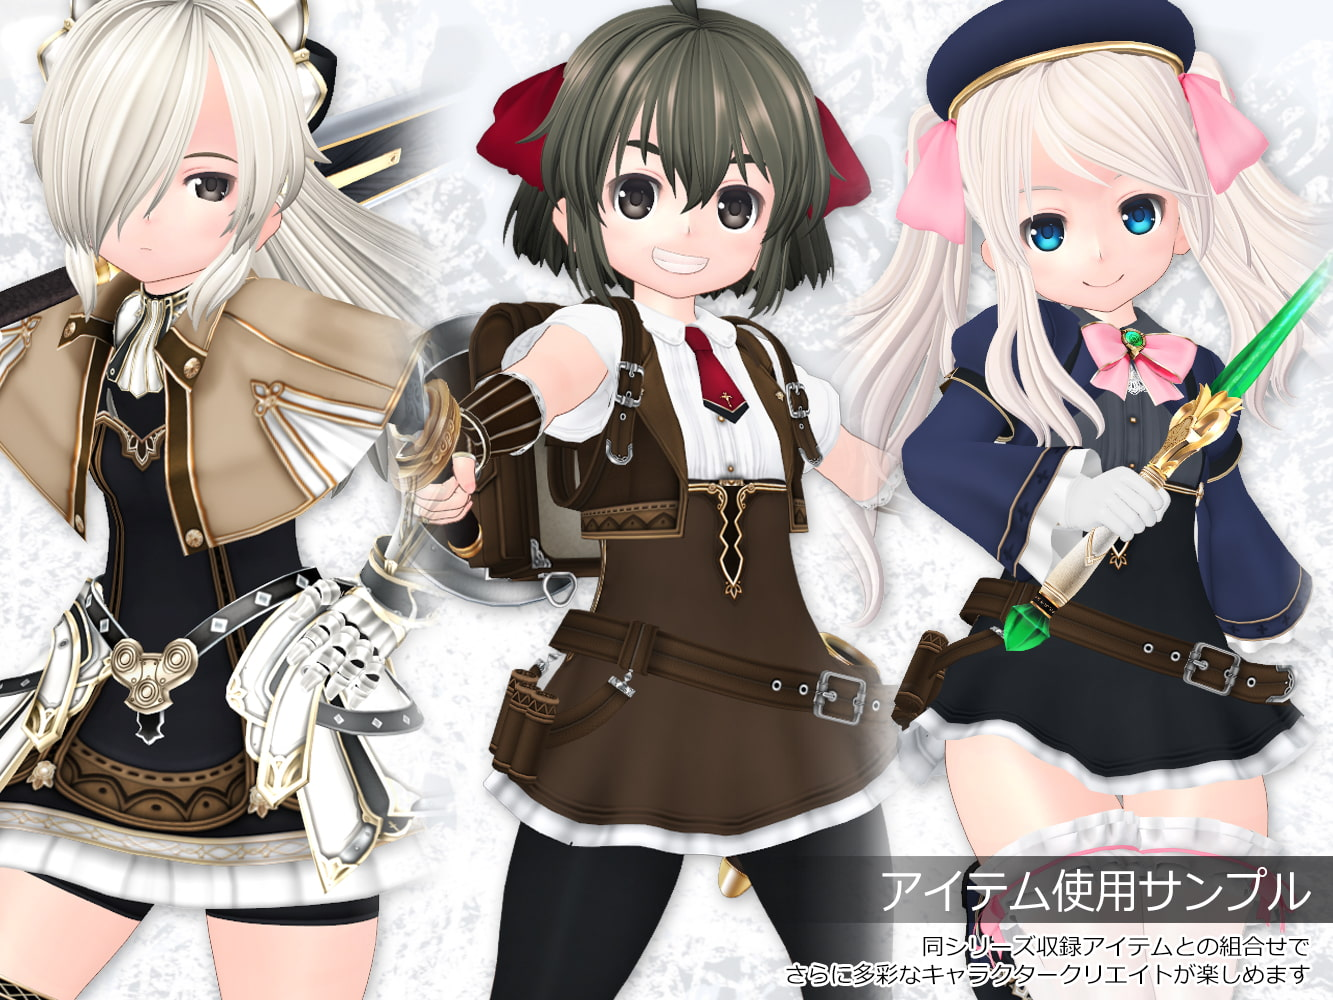 3Dカスタム少女データ集 王立冒険者アカデミー 追加パック03